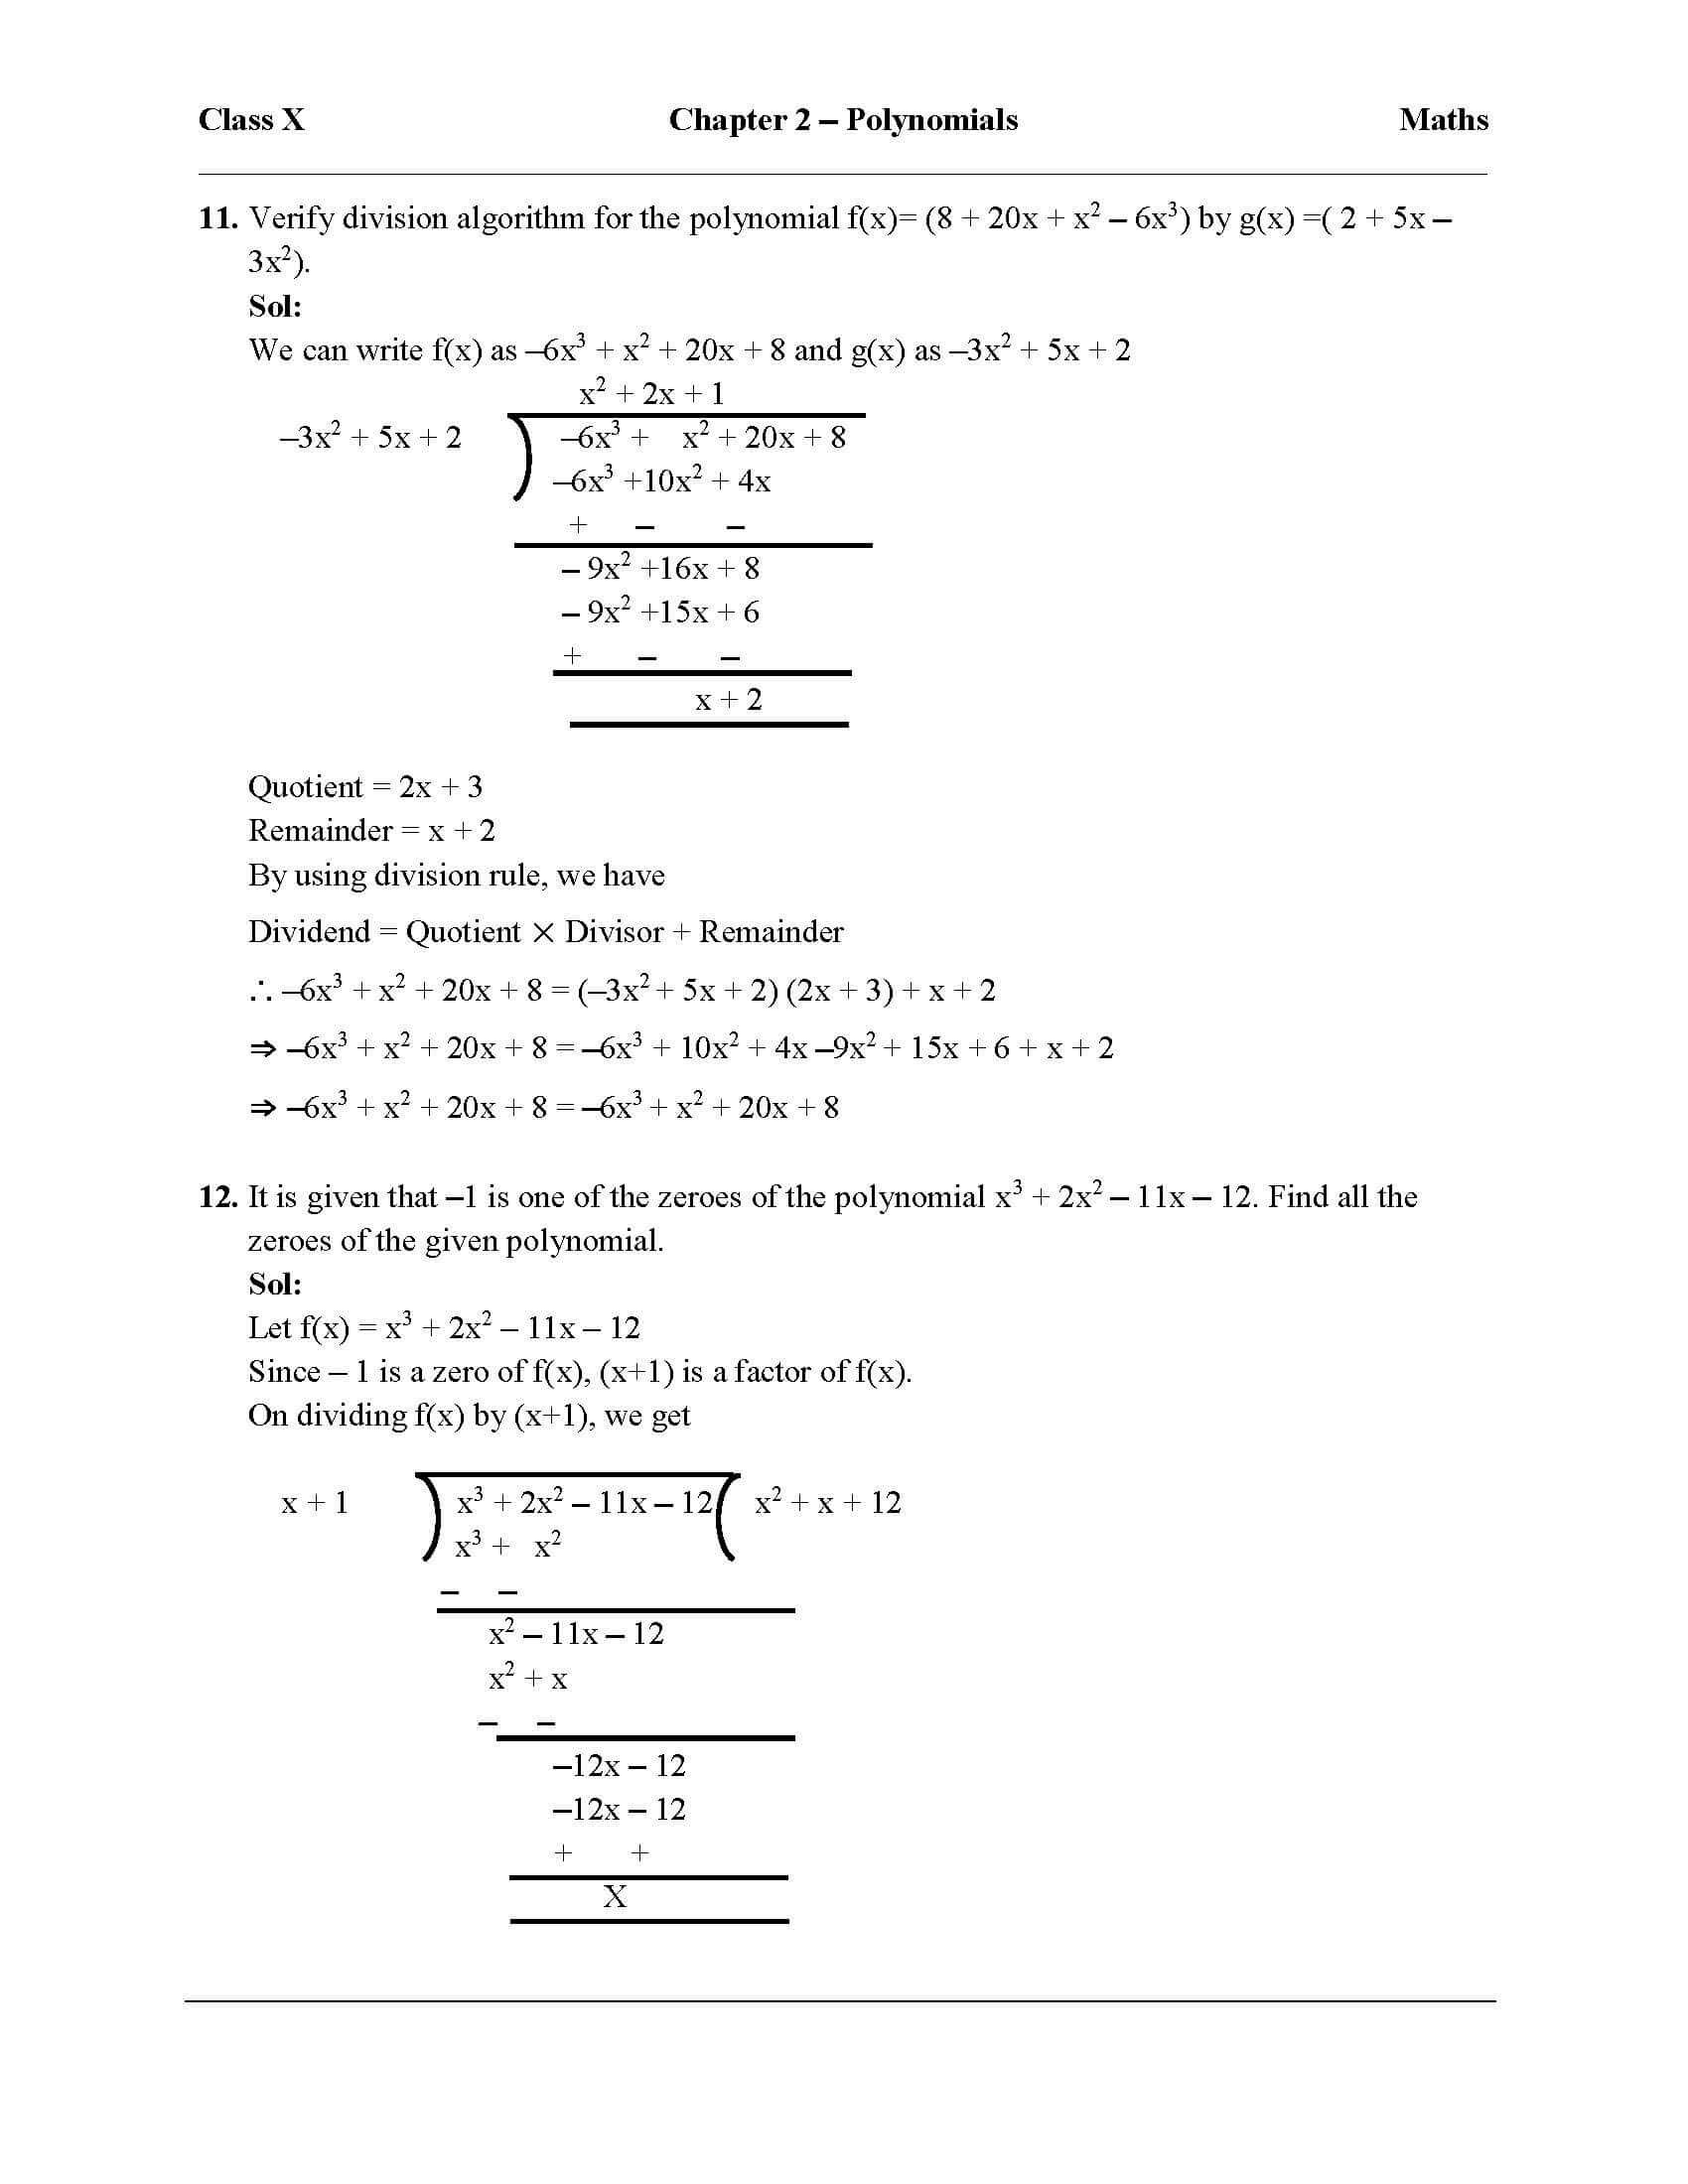 Worksheet Long Division Of Polynomials